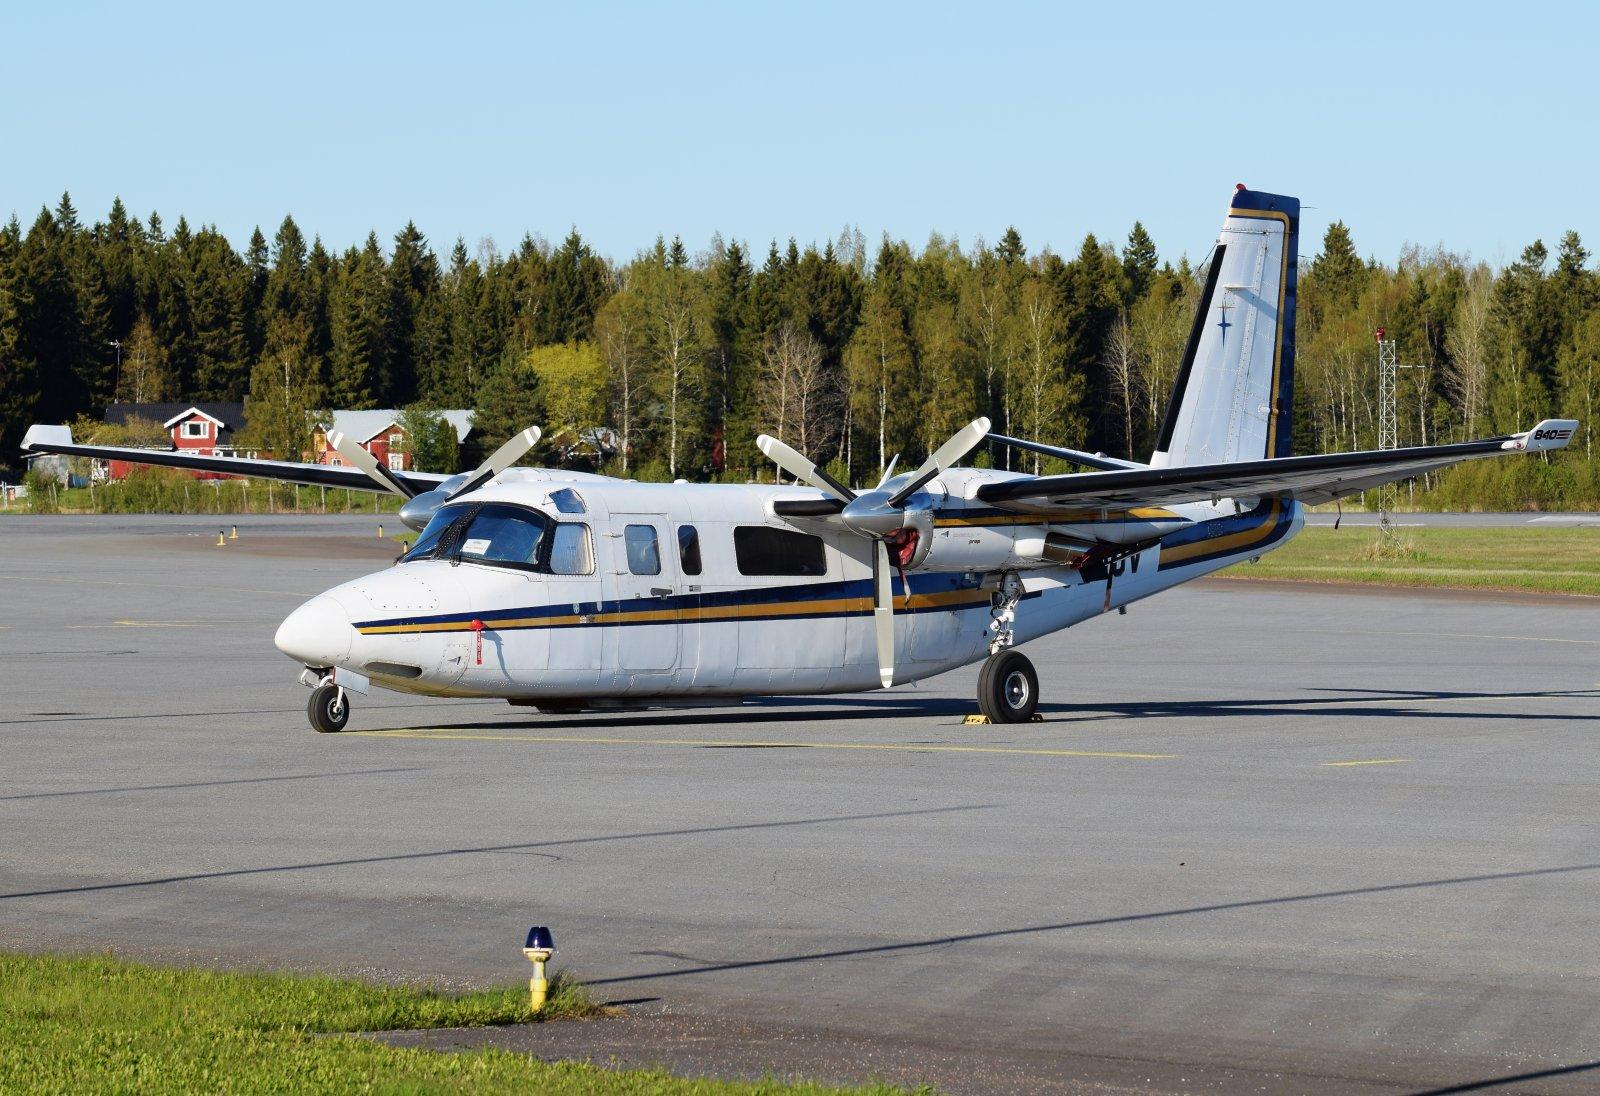 SE-IUV - Rockwell 690C Commander Jetprop 840 - Wermlandsflyg - 17.5.2019